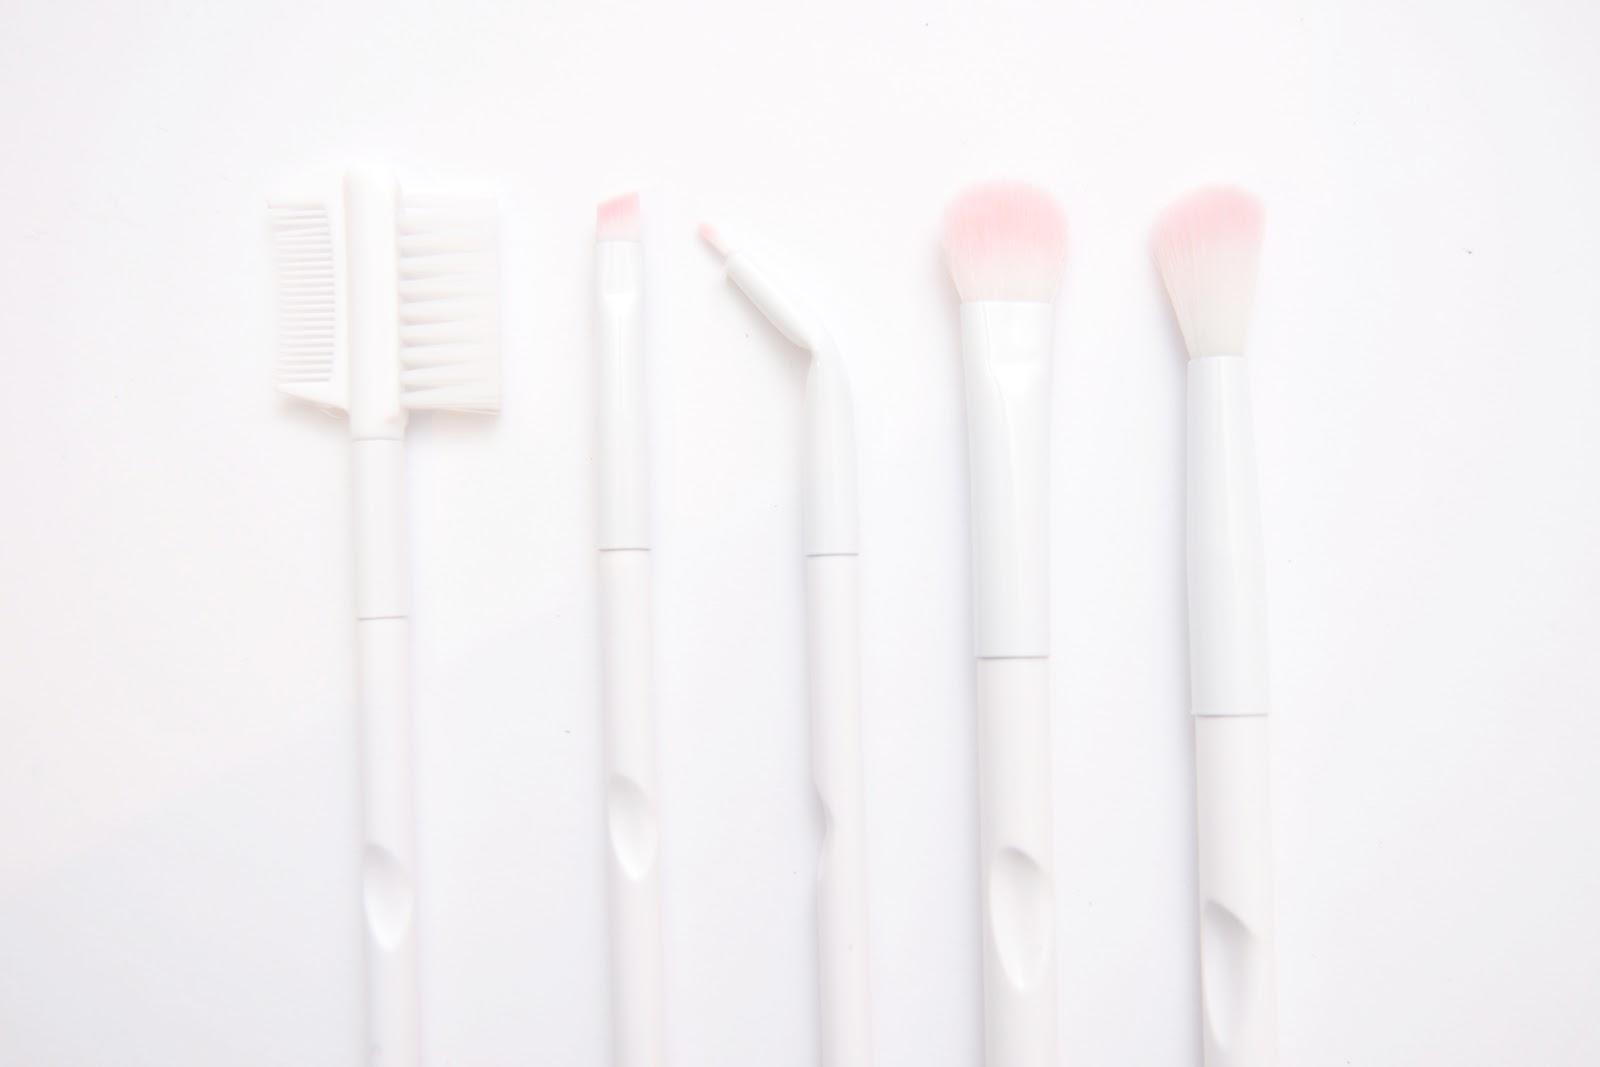 It Cosmetics x ULTA Love Beauty Fully Angled Liner/Brow Brush #217 by IT Cosmetics #15